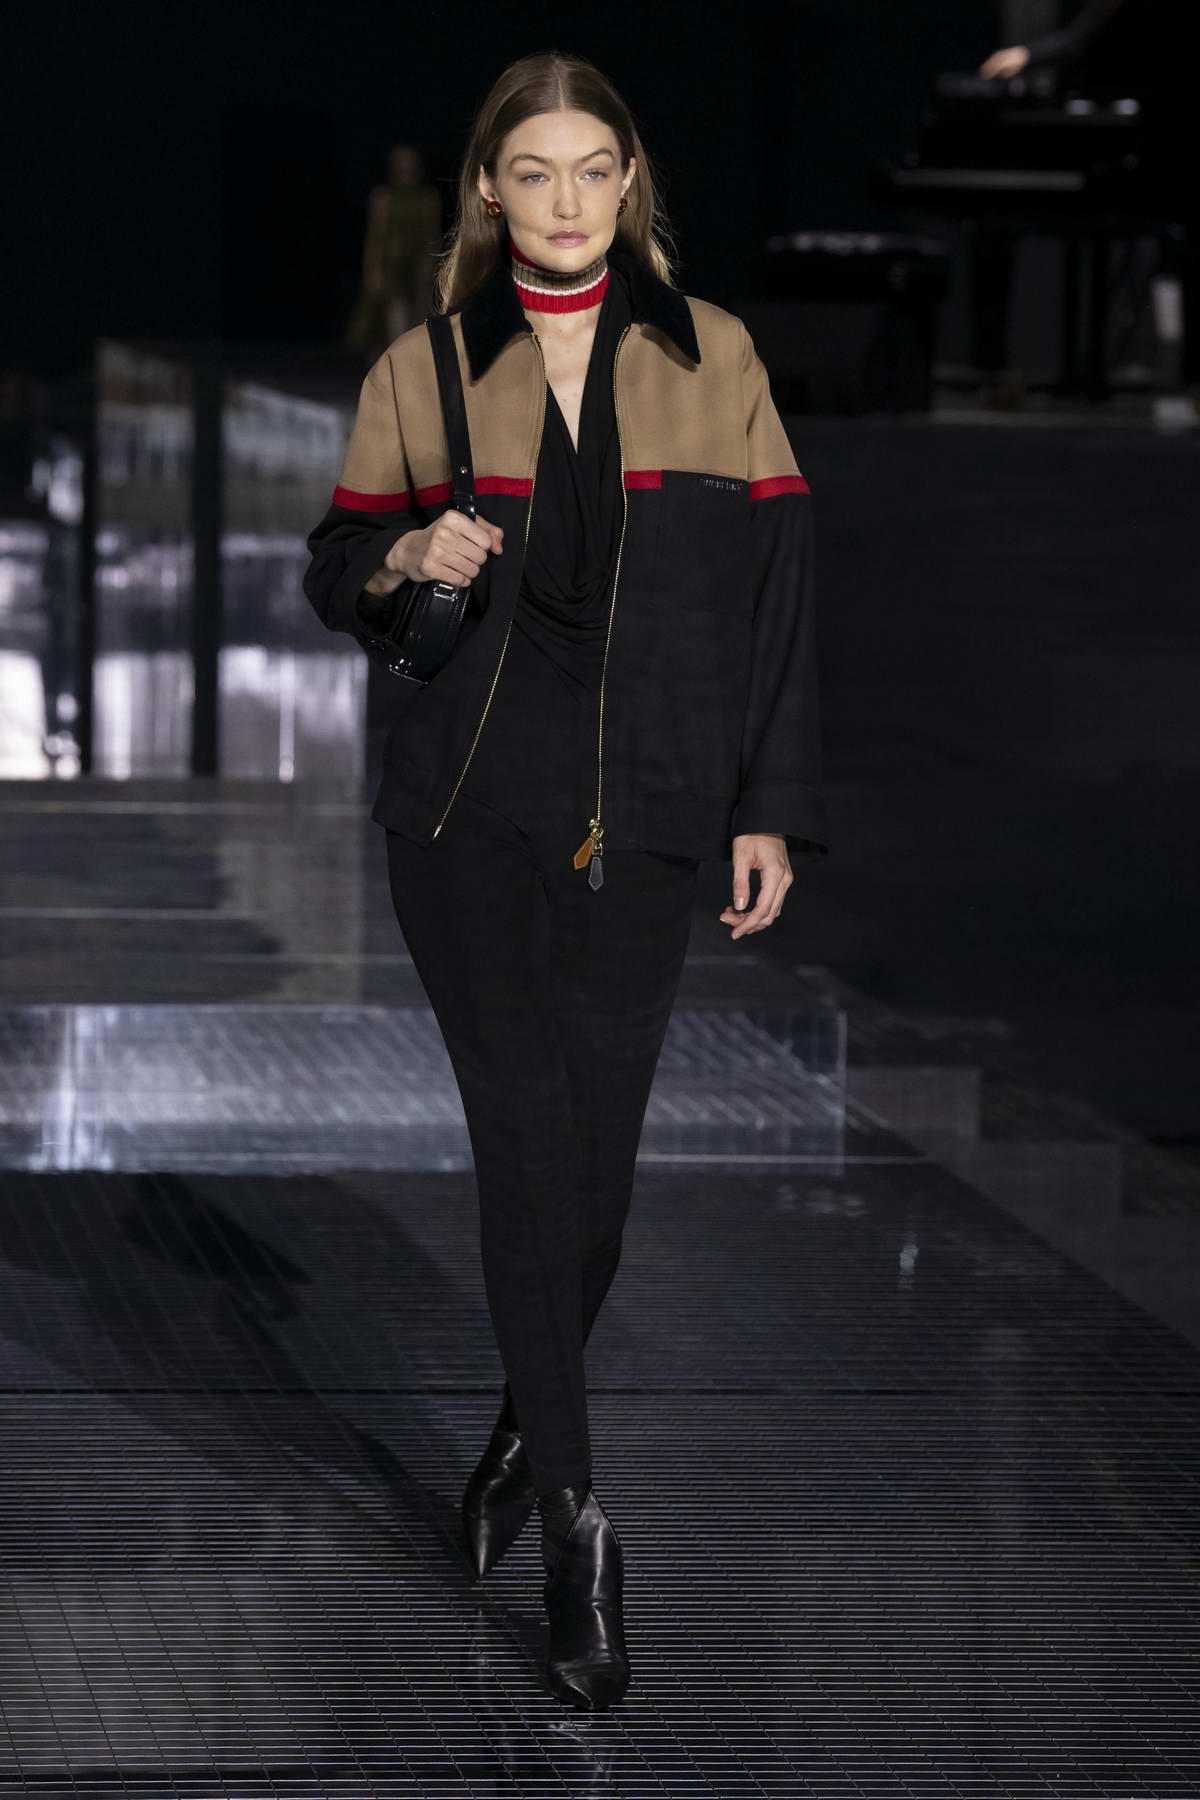 Gigi Hadid walks the Burberry AW20 runway during London Fashion Week in London, UK